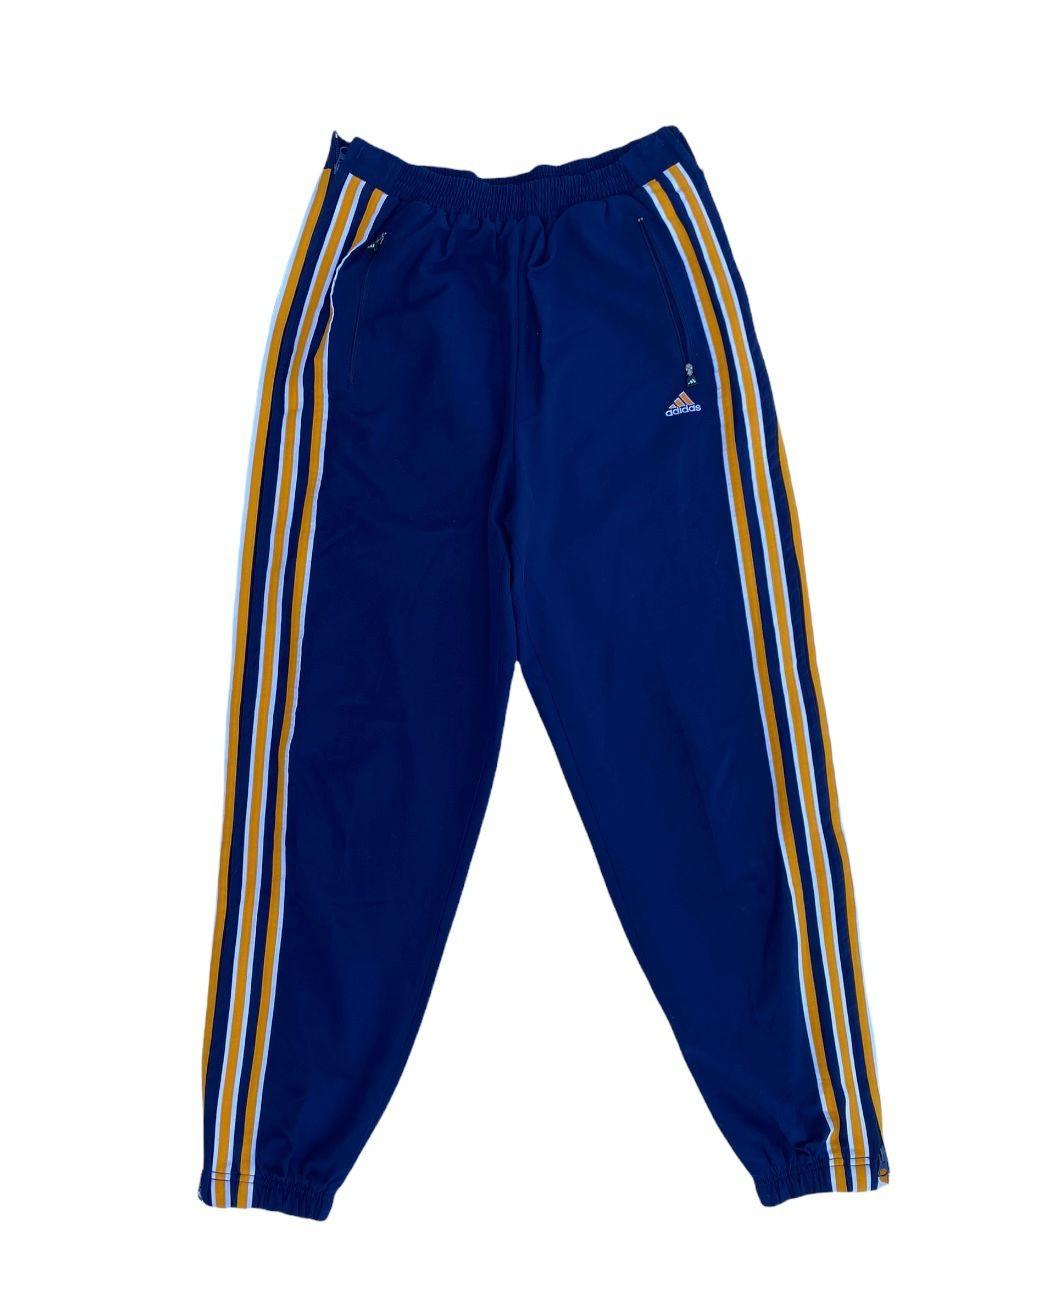 Adidas 00's Full Zip Jogger (M)